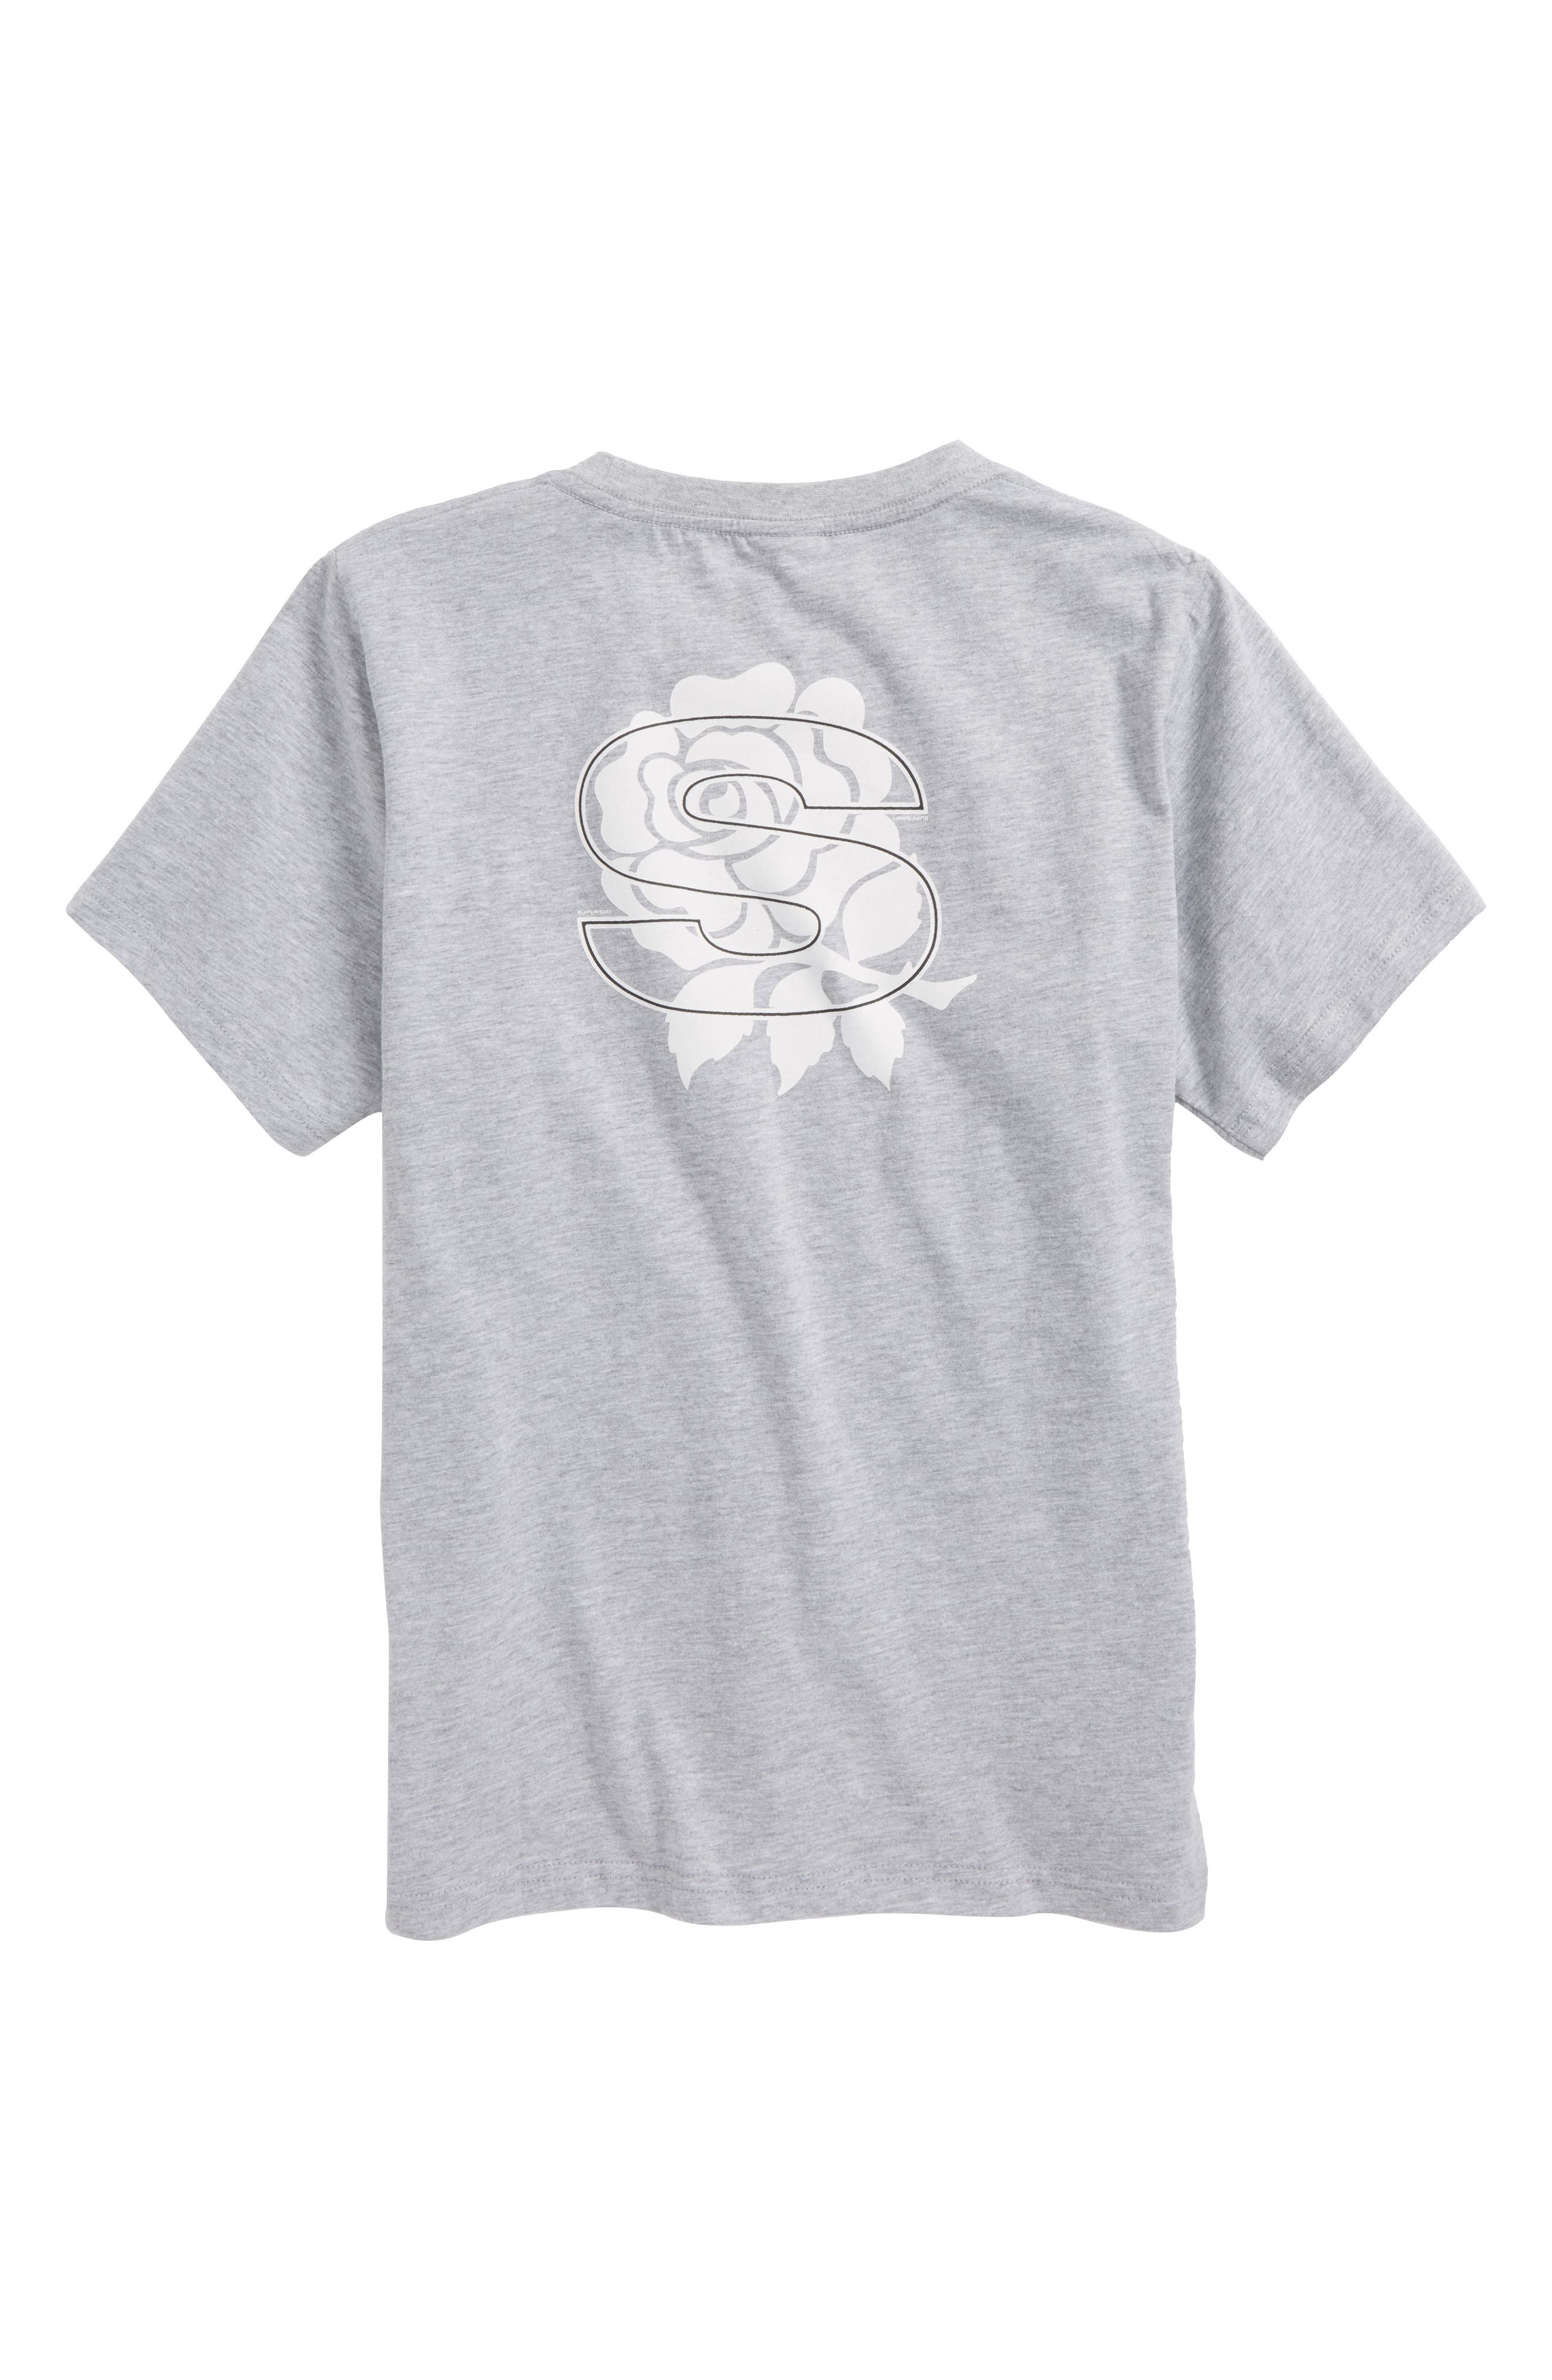 Rose Vision T-Shirt,                             Alternate thumbnail 2, color,                             Heather Grey